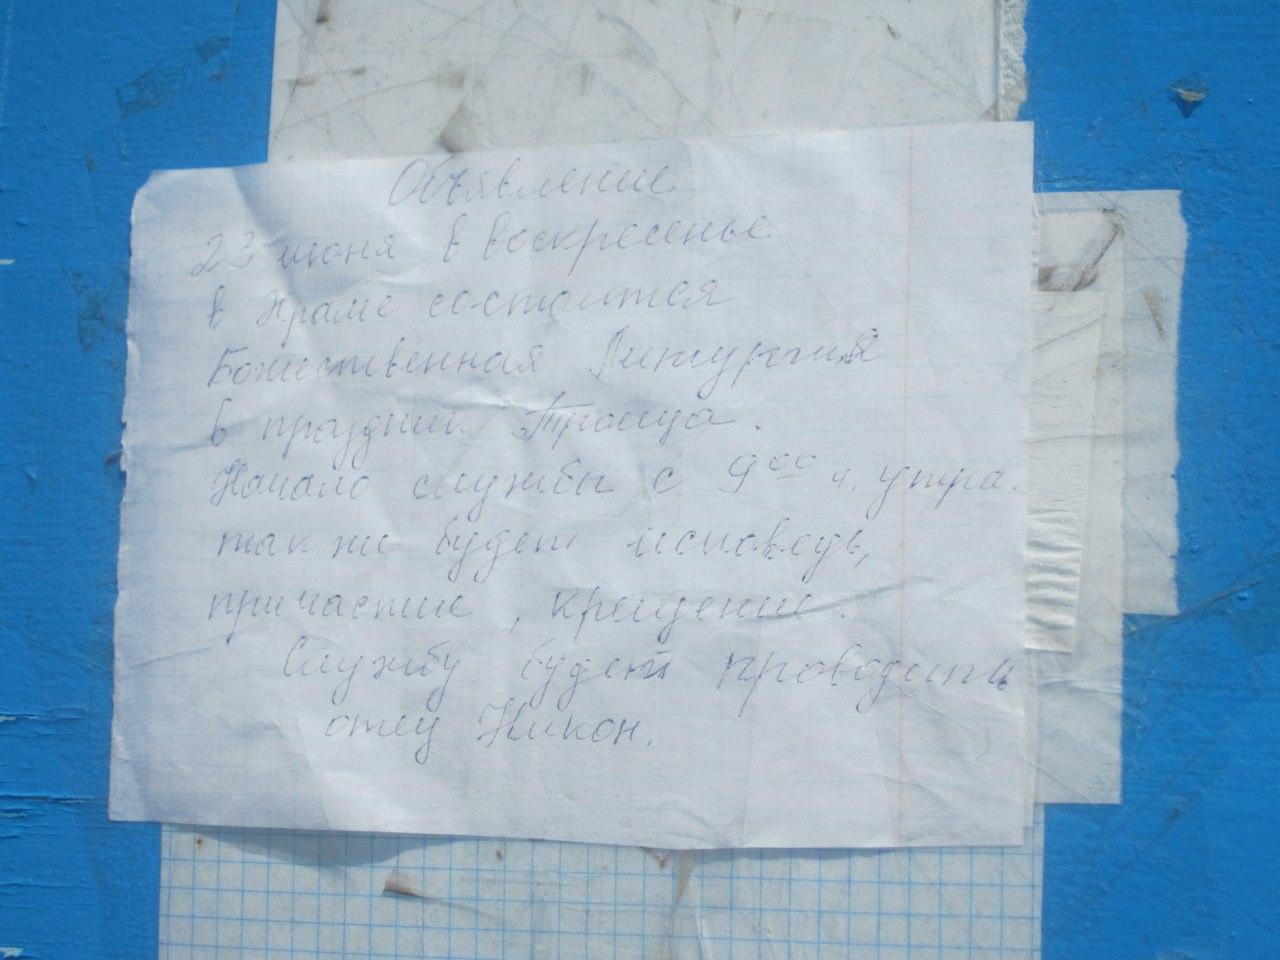 Объявление на воротах (25.06.2013)